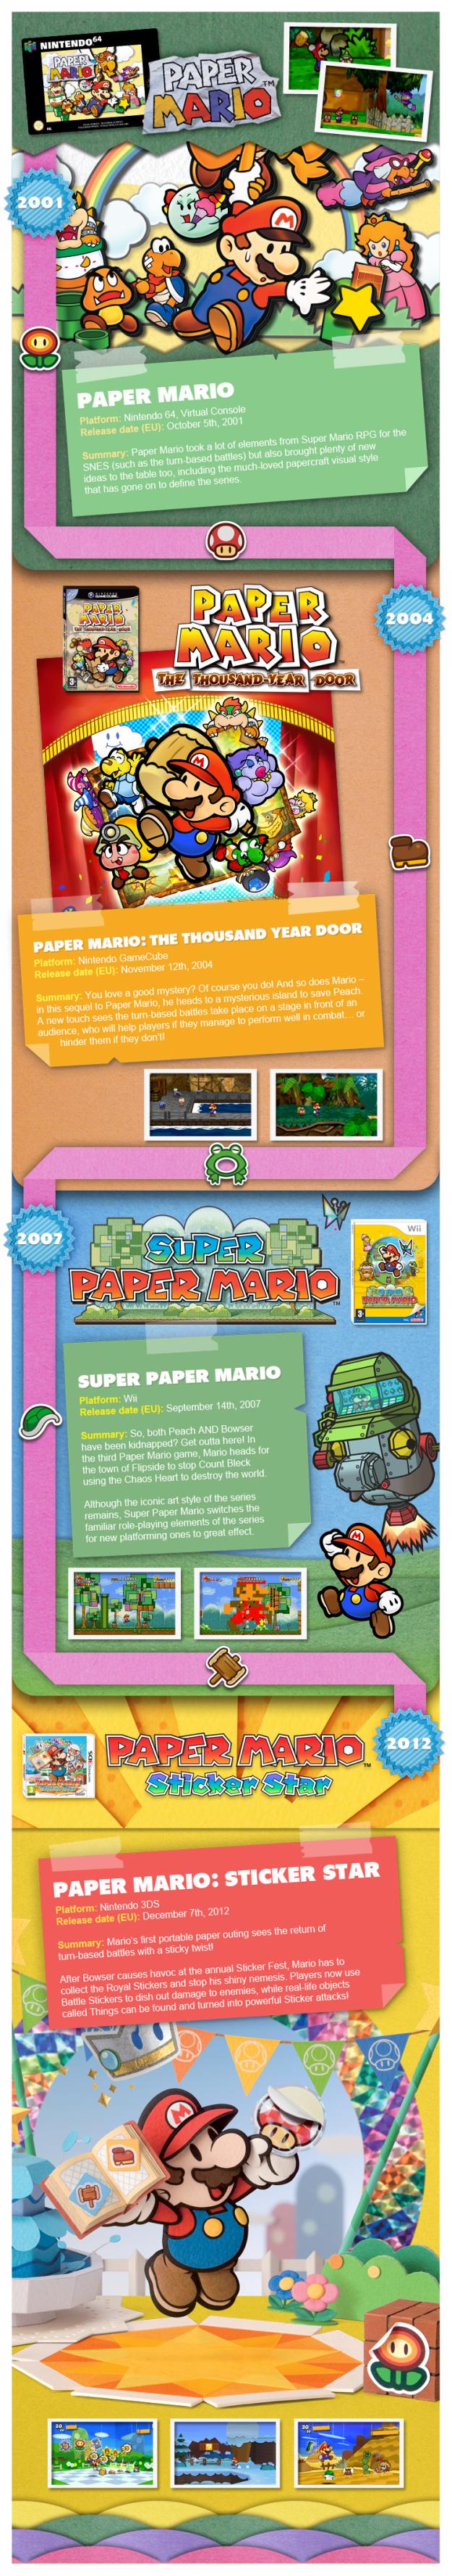 paper_mario_time_line